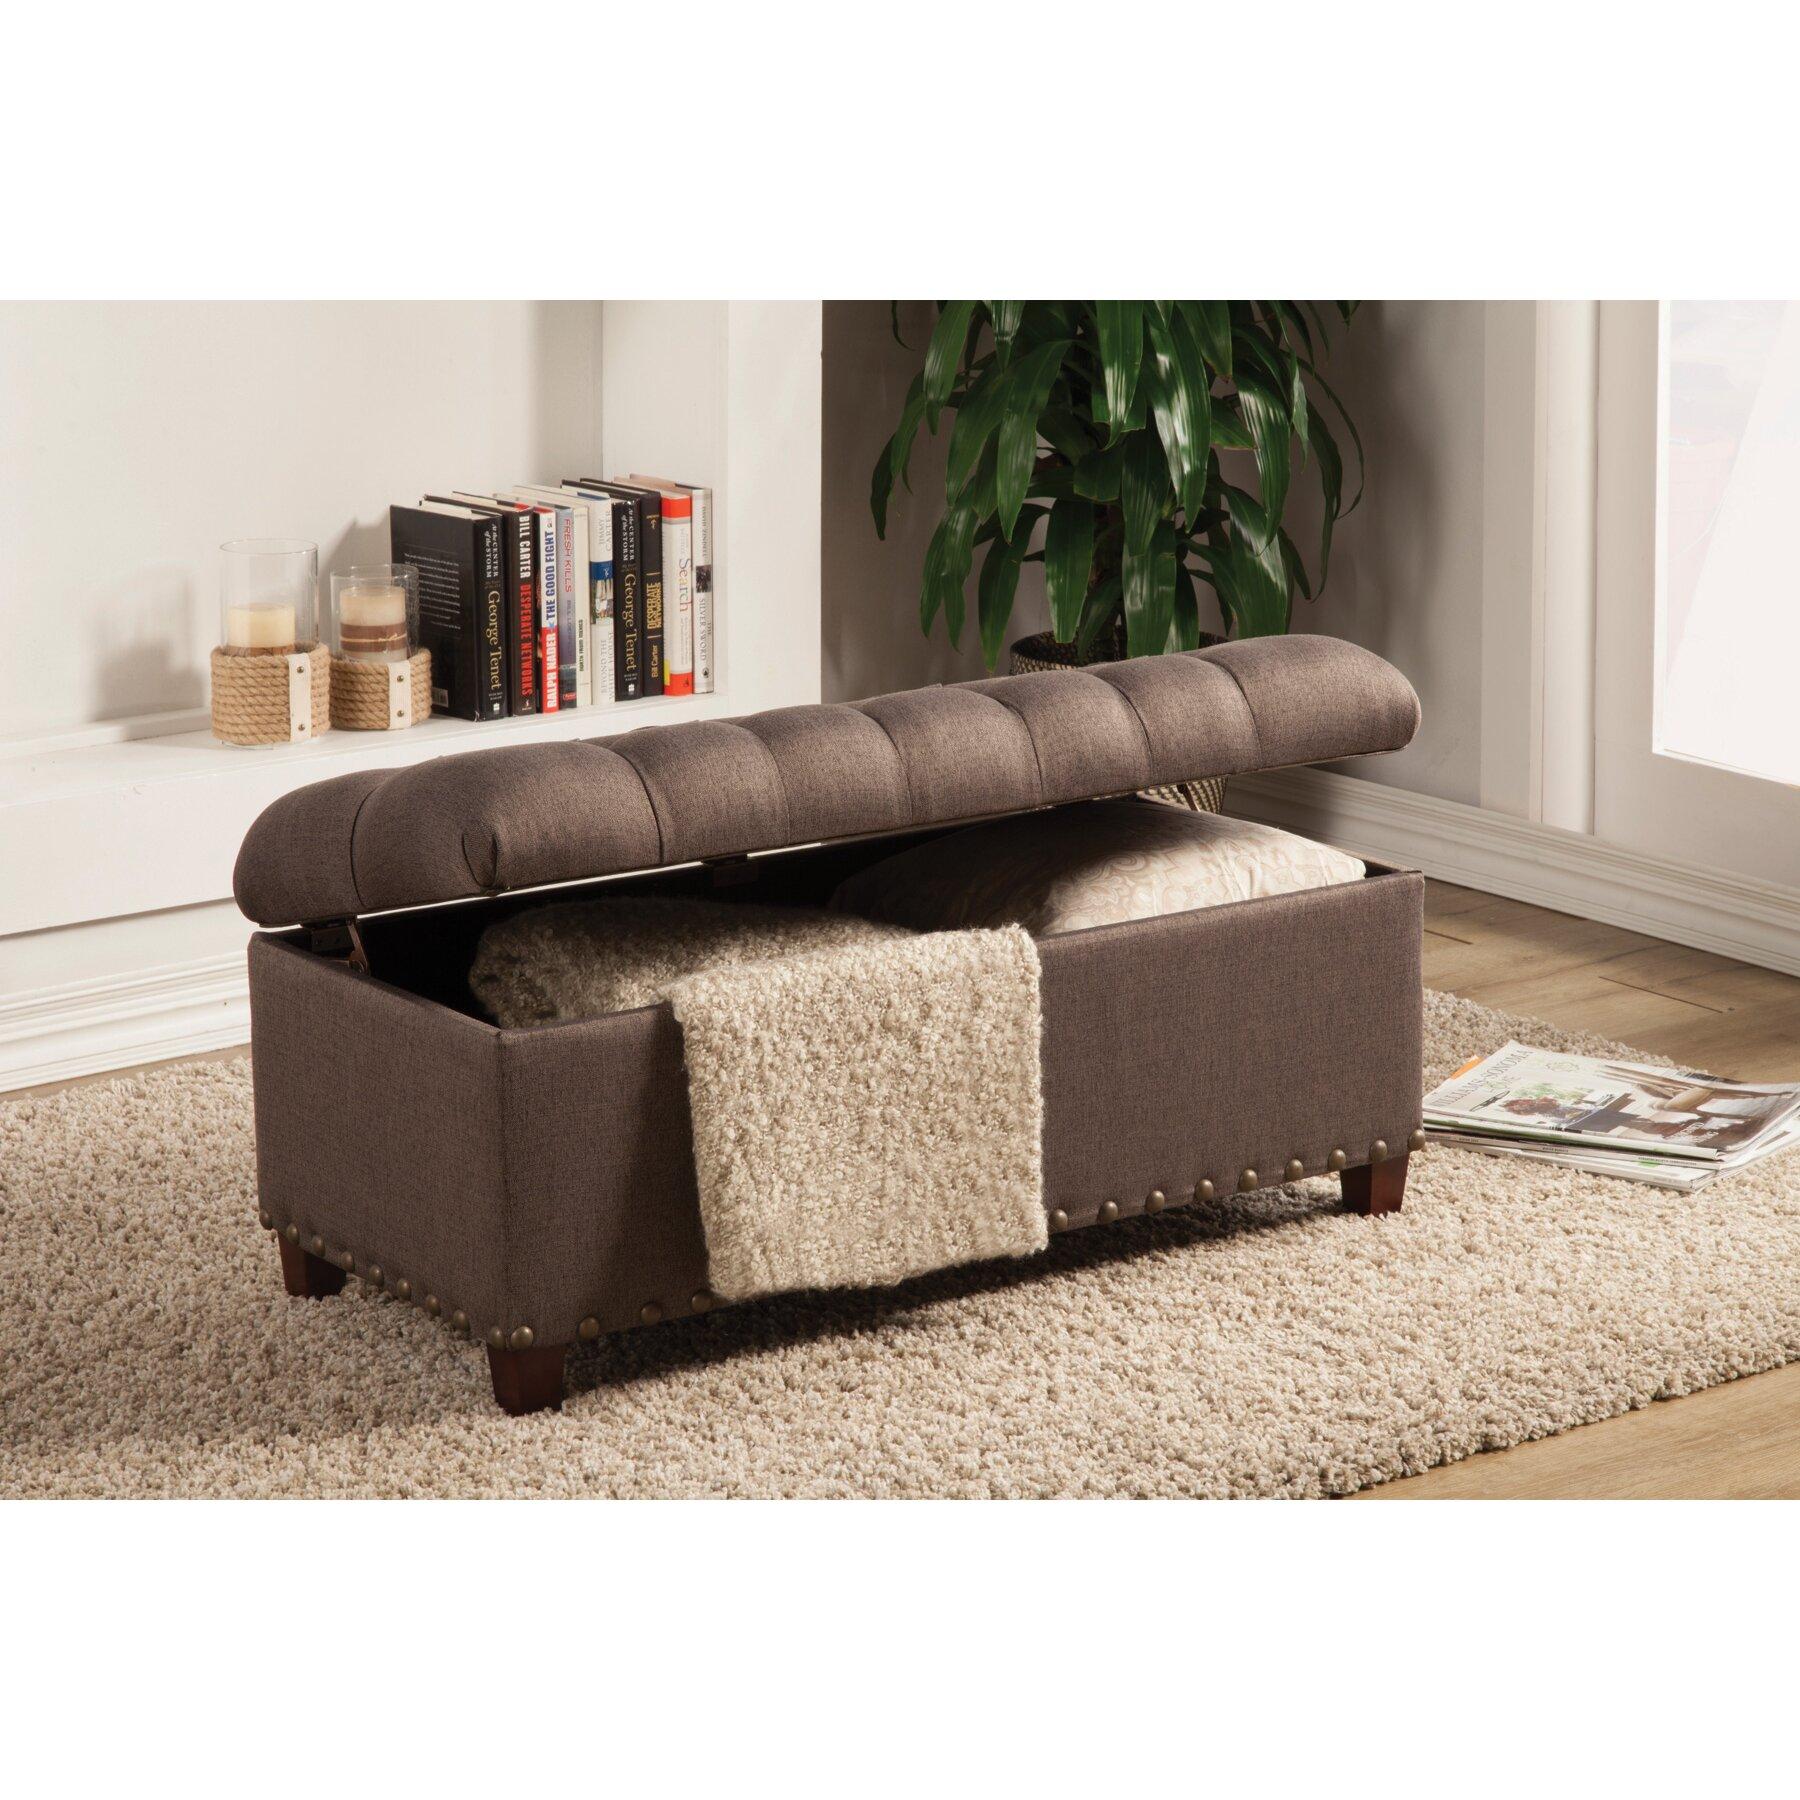 Alcott Hill Henderson Upholstered Storage Bedroom Bench Reviews Wayfair